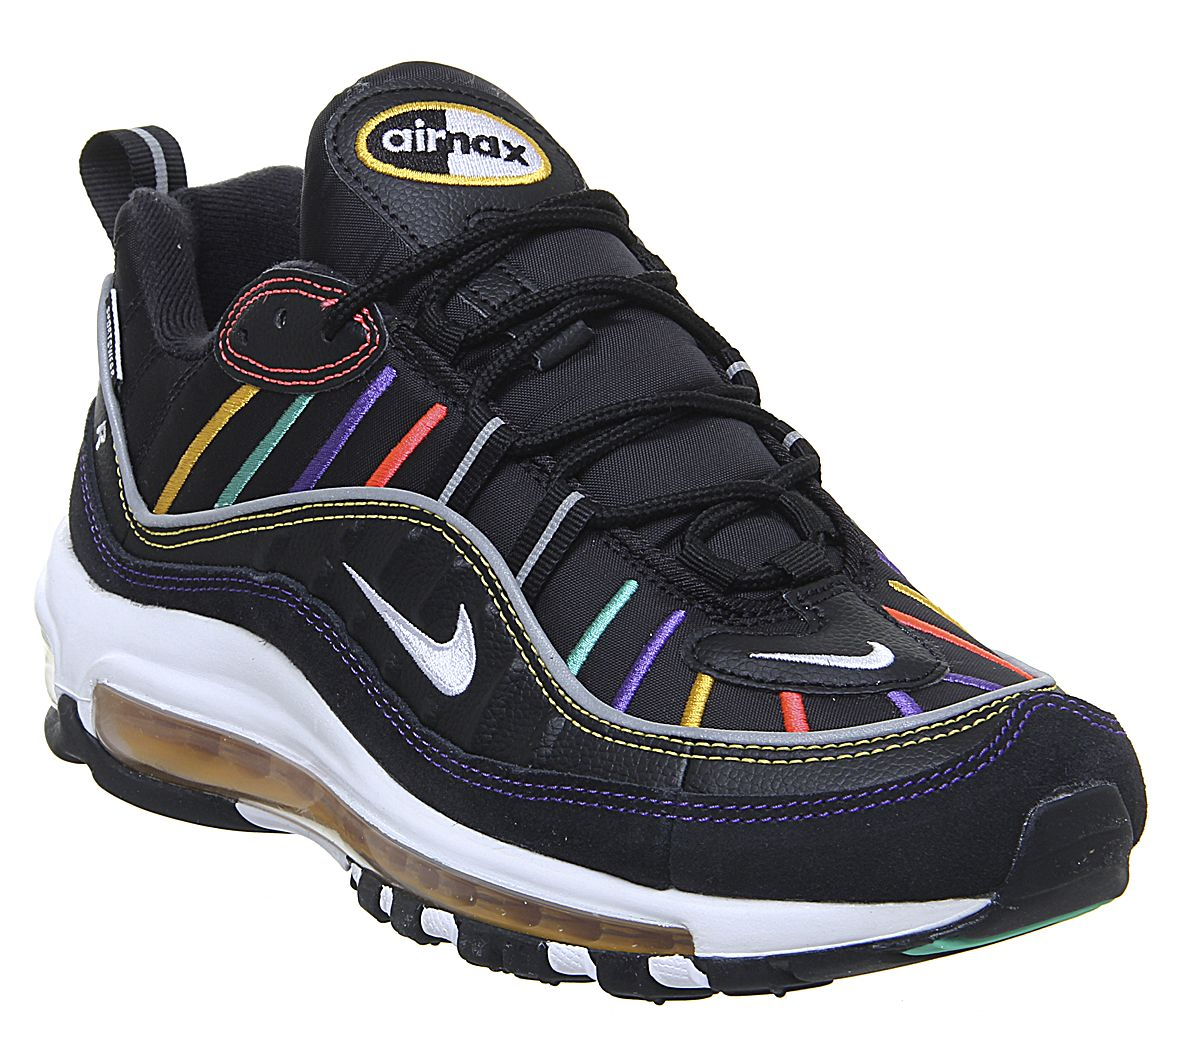 huge selection of 337c1 ccb10 Nike Air Max 98 Trainers Black Flash Crimson Kinetic Green ...